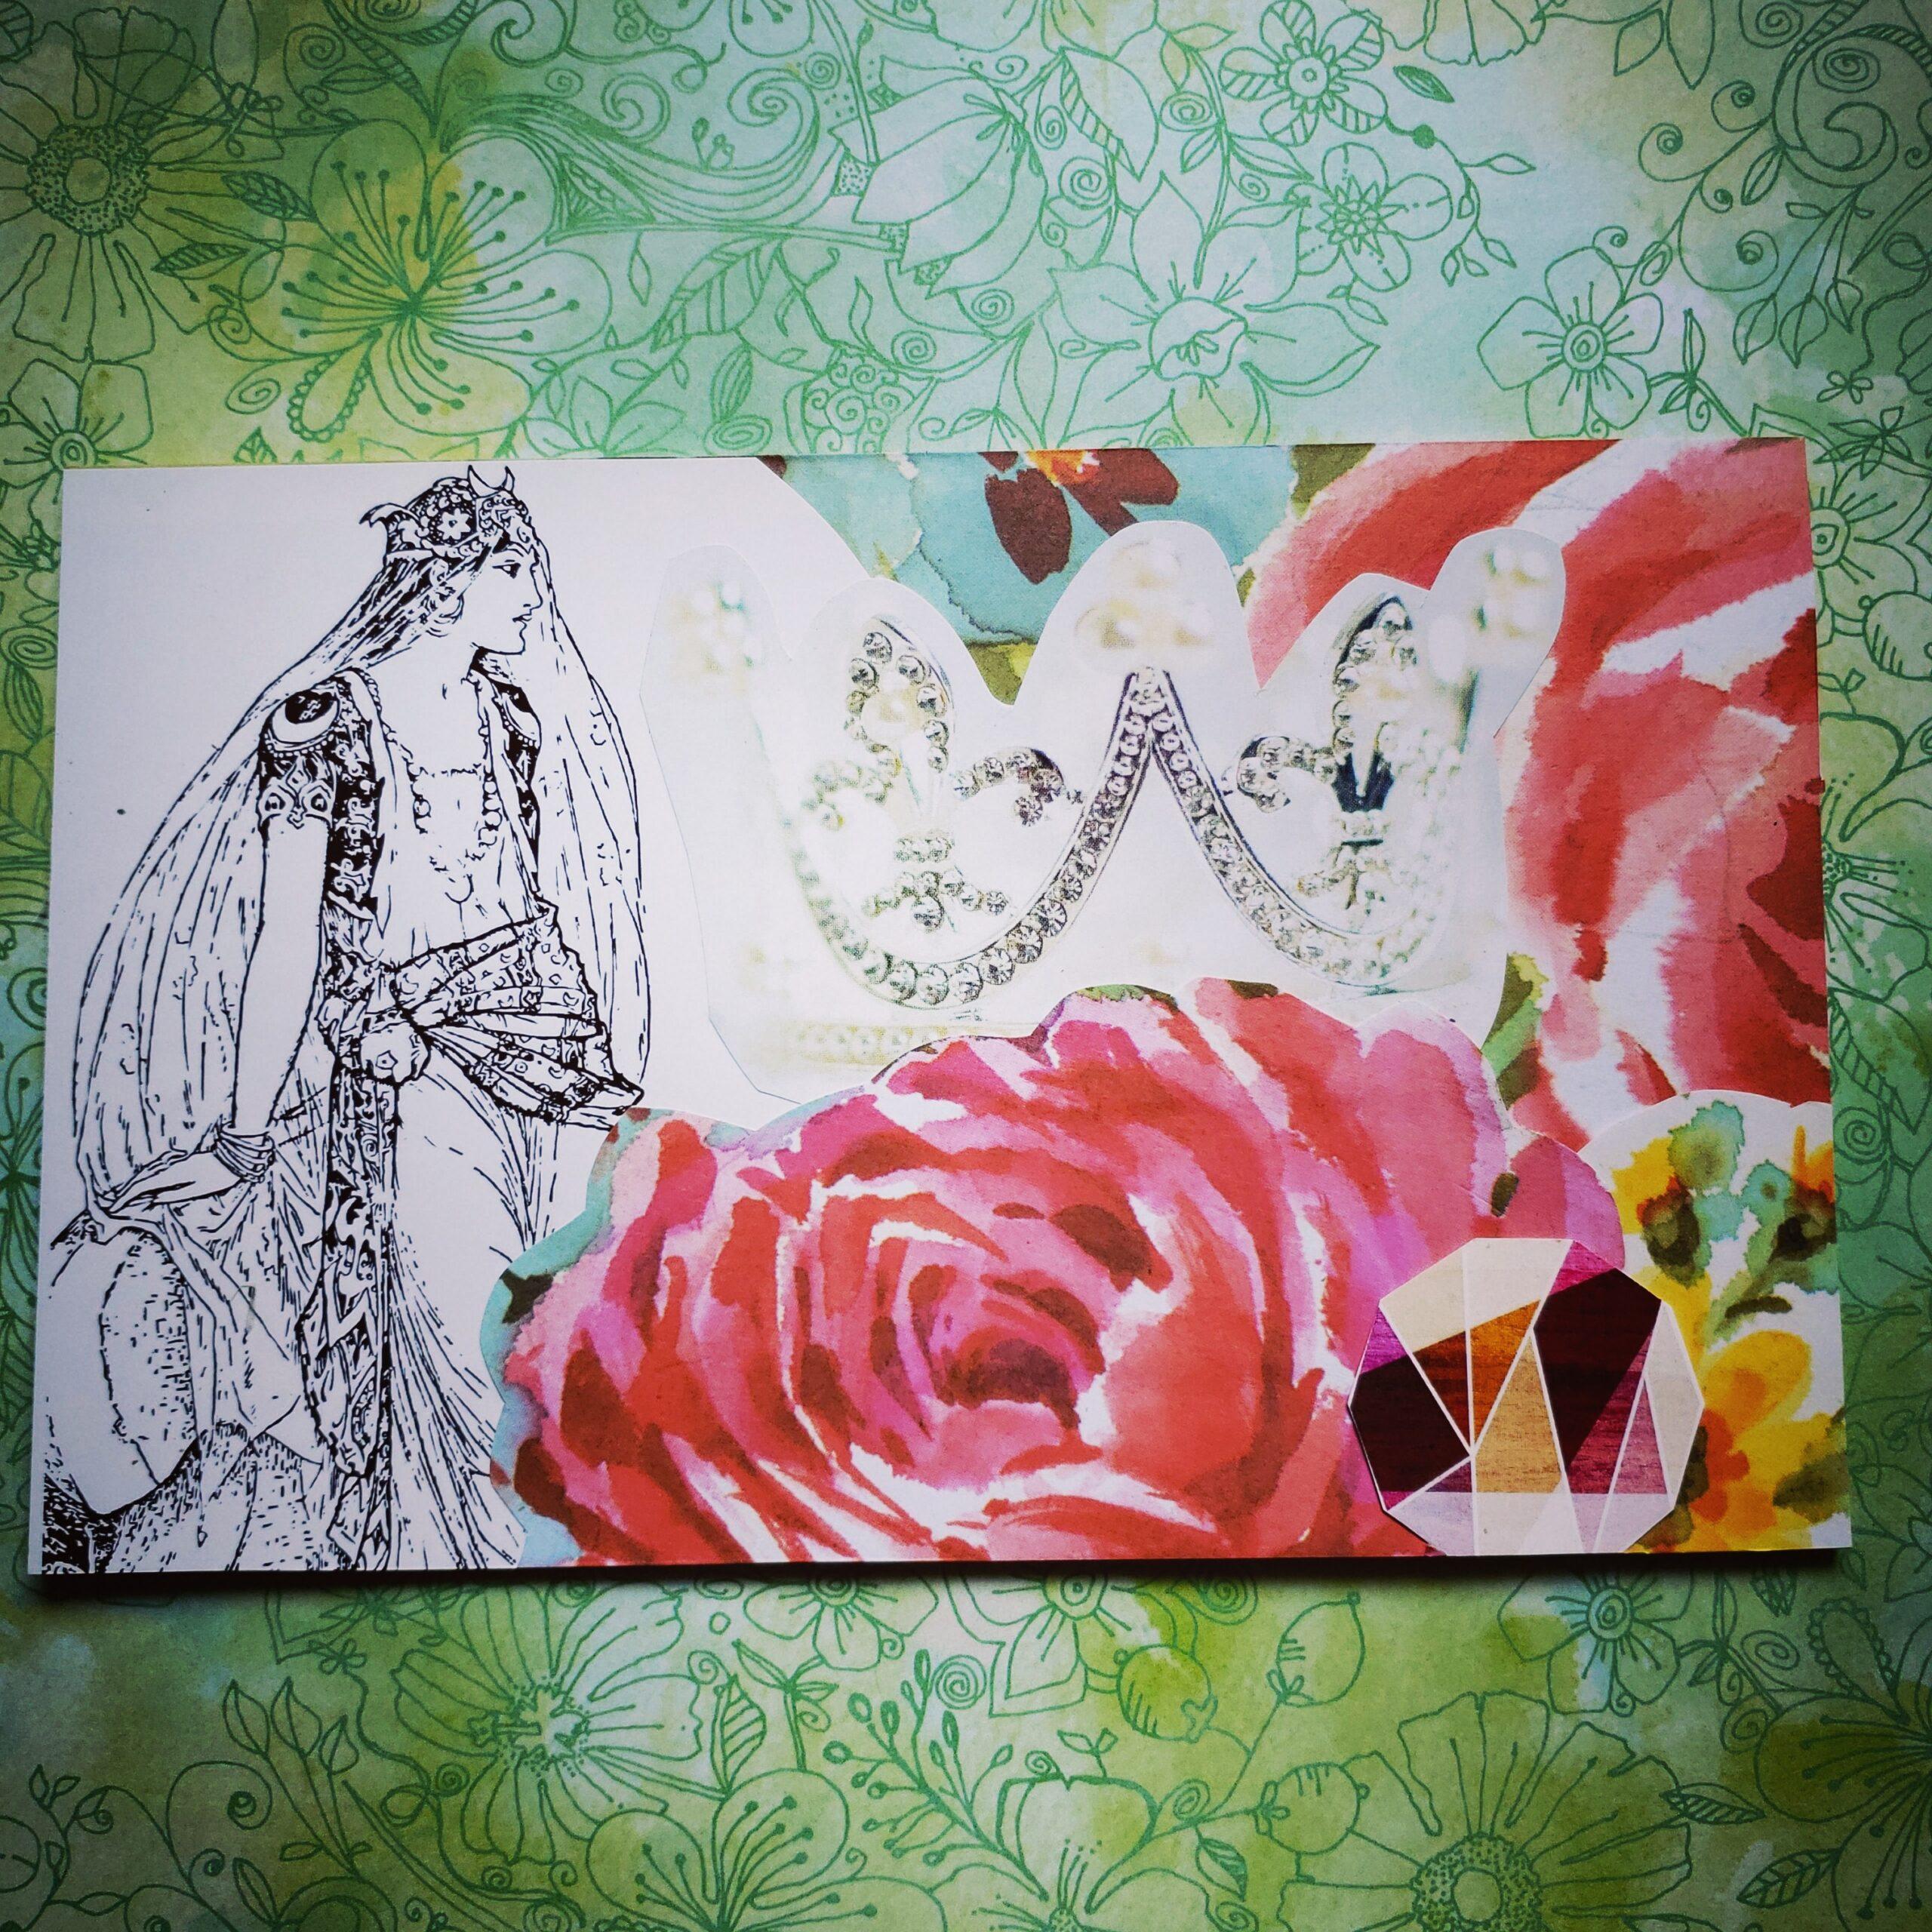 soulcollage card jj creates